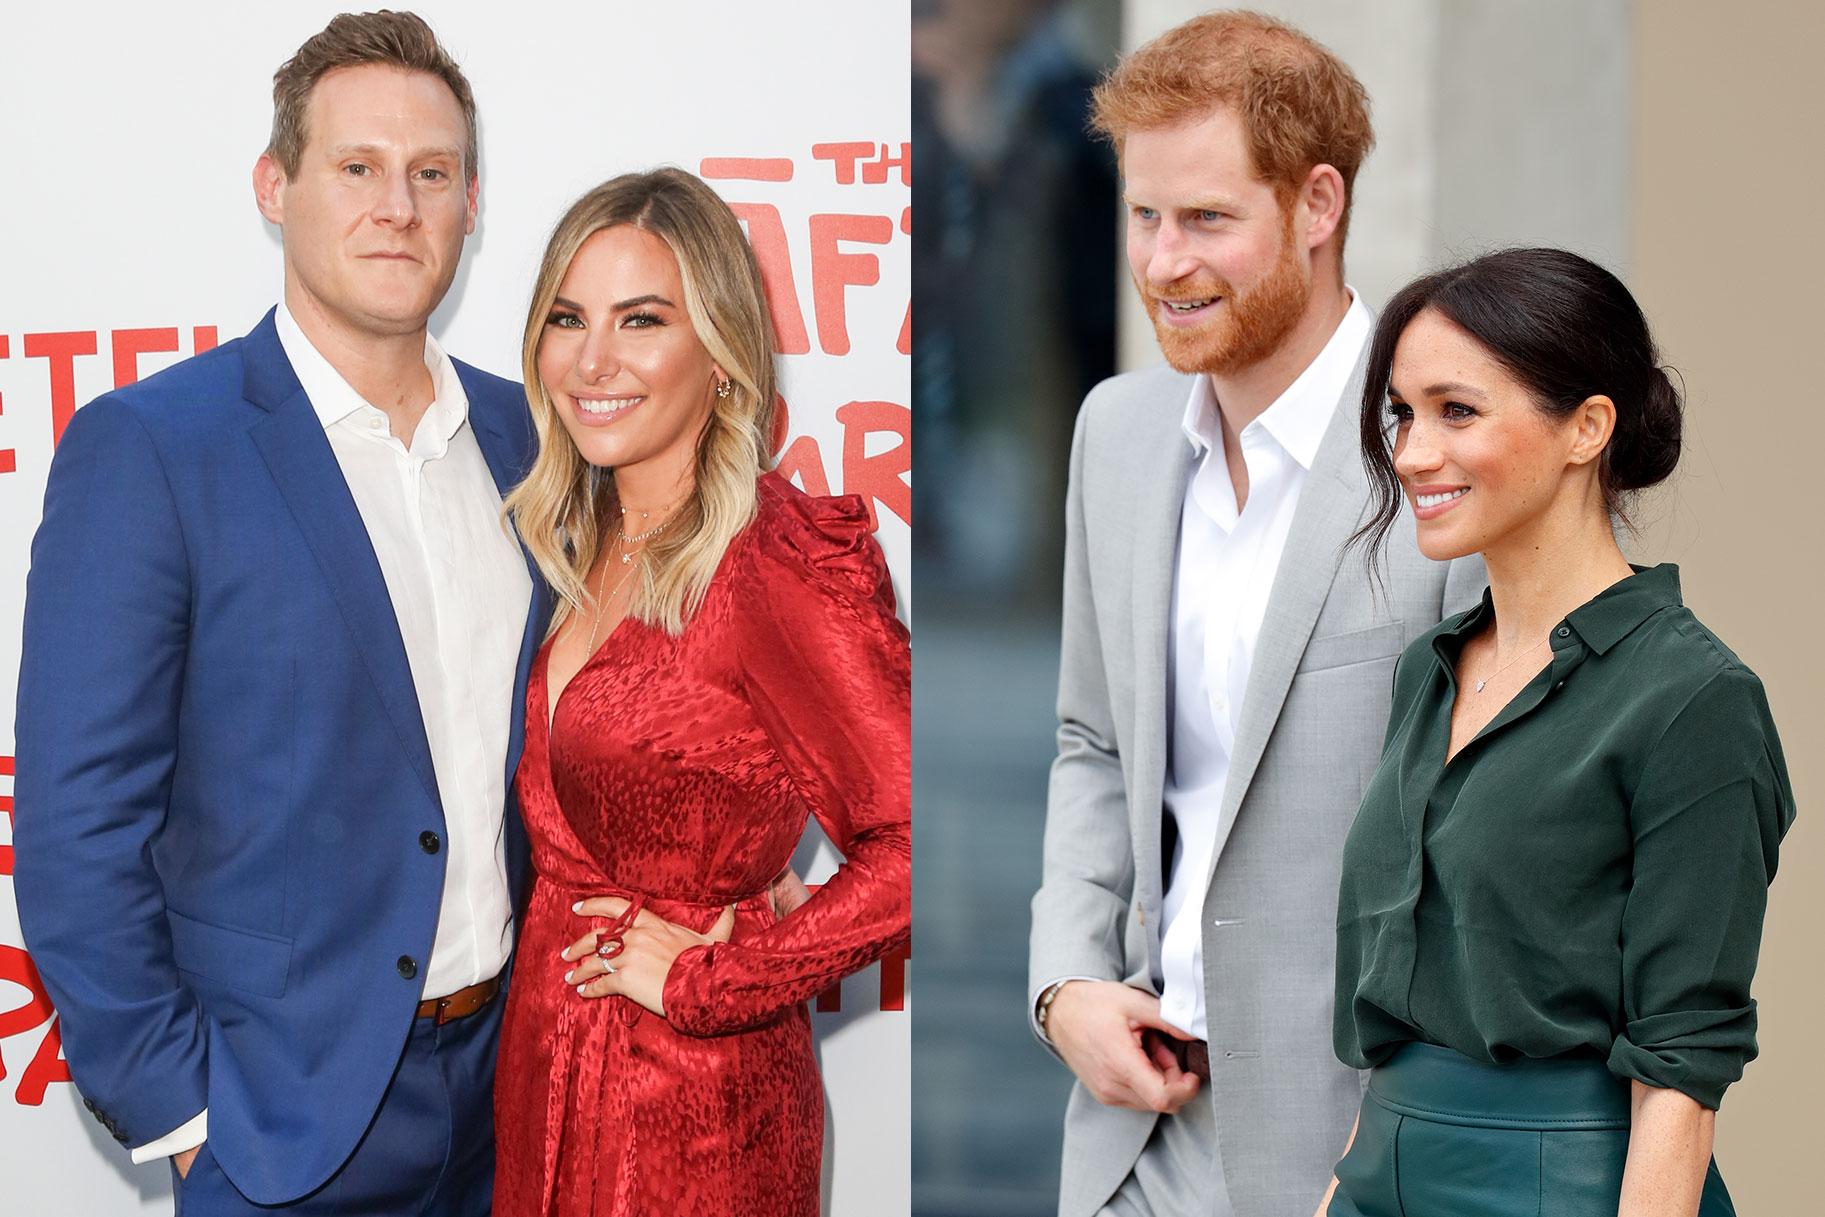 Meghan Markle's Ex Trevor Engleson Married Tracey Kurland